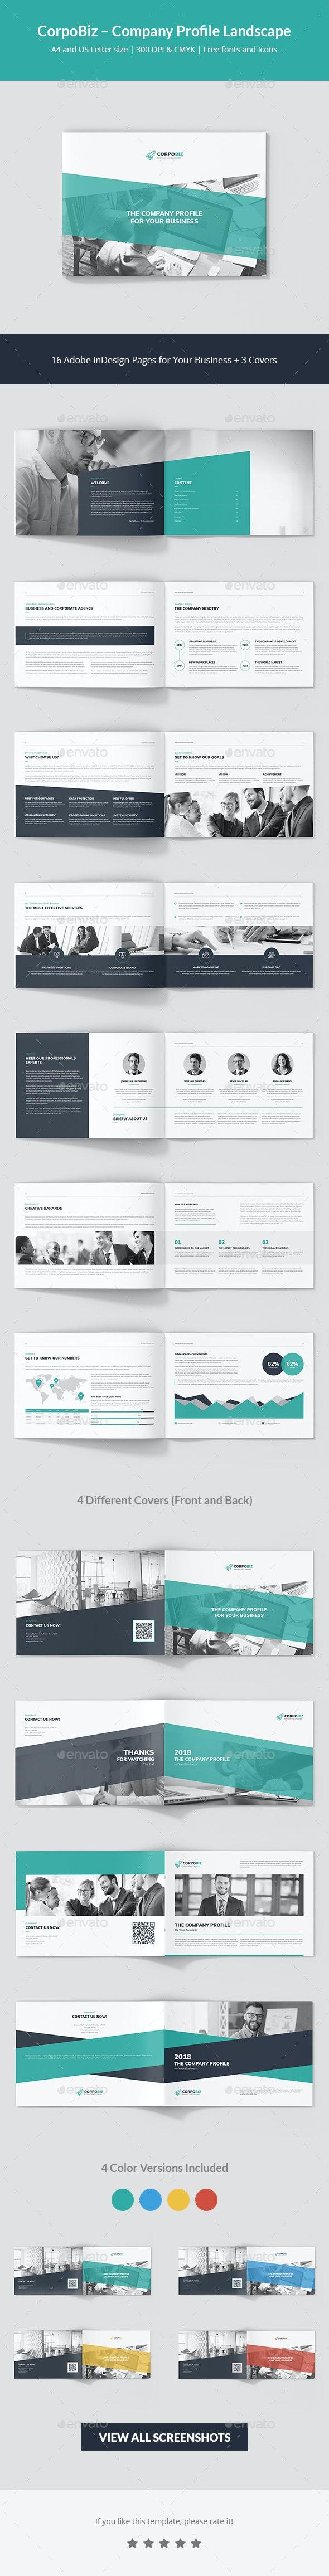 CorpoBiz – Business and Corporate Company Profile Landscape - Corporate Brochures